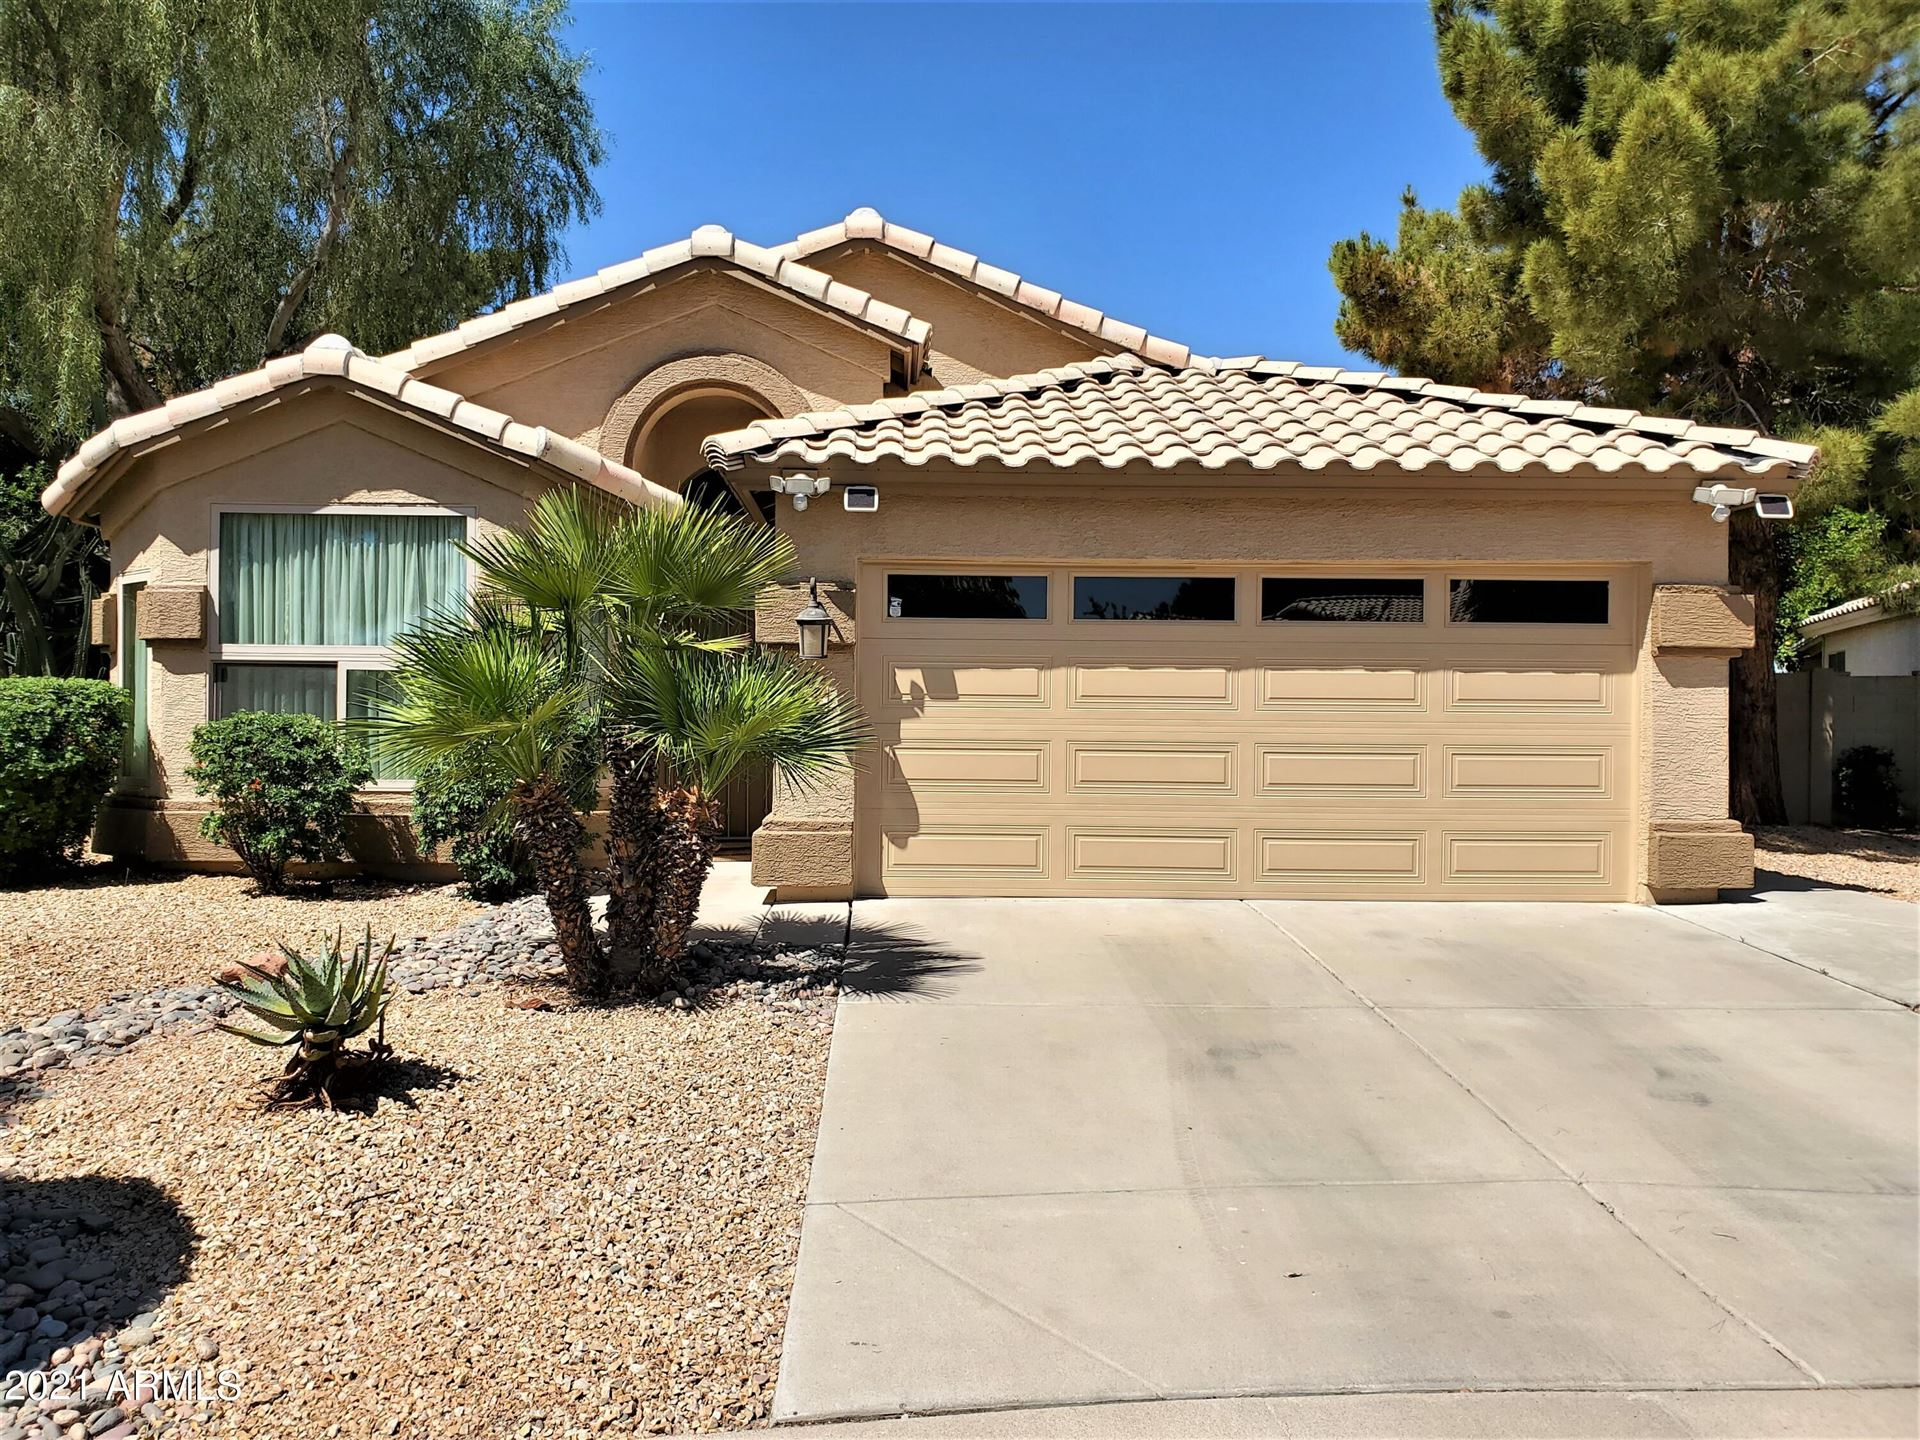 1402 N BIRCH Street, Gilbert, AZ 85233 - #: 6232653